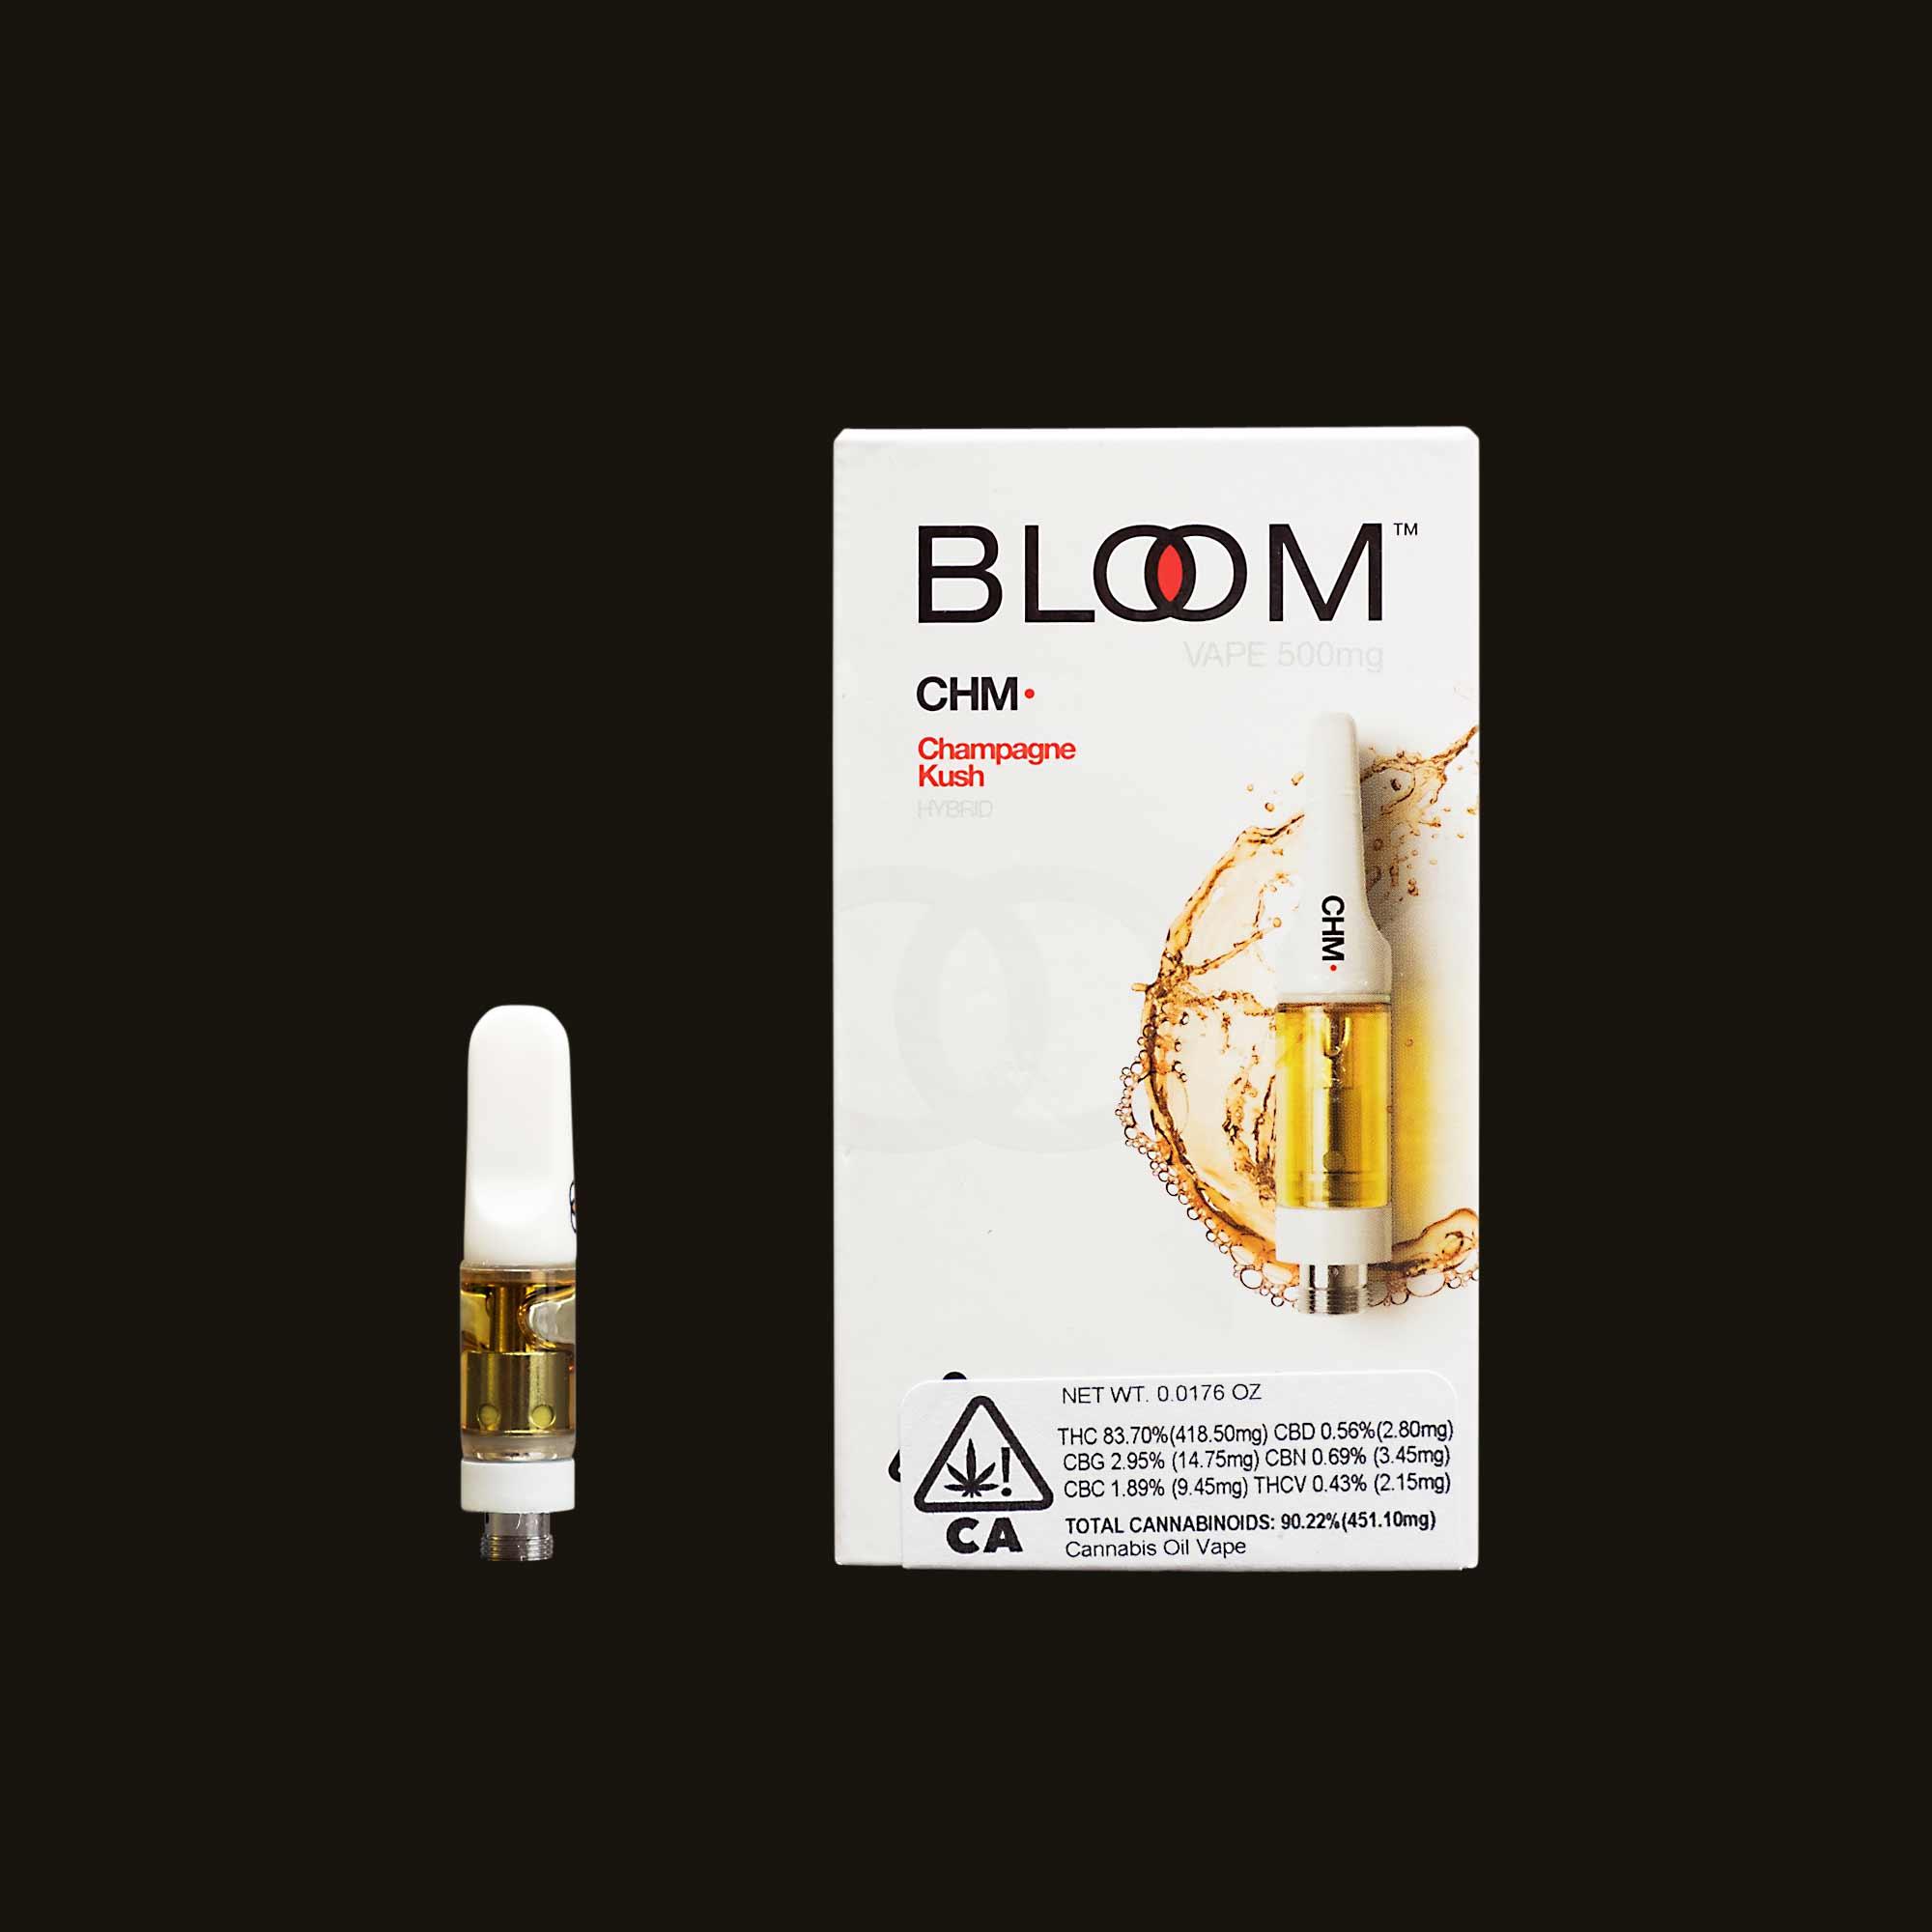 Bloom Brands Champagne Kush Cartridge - .5g